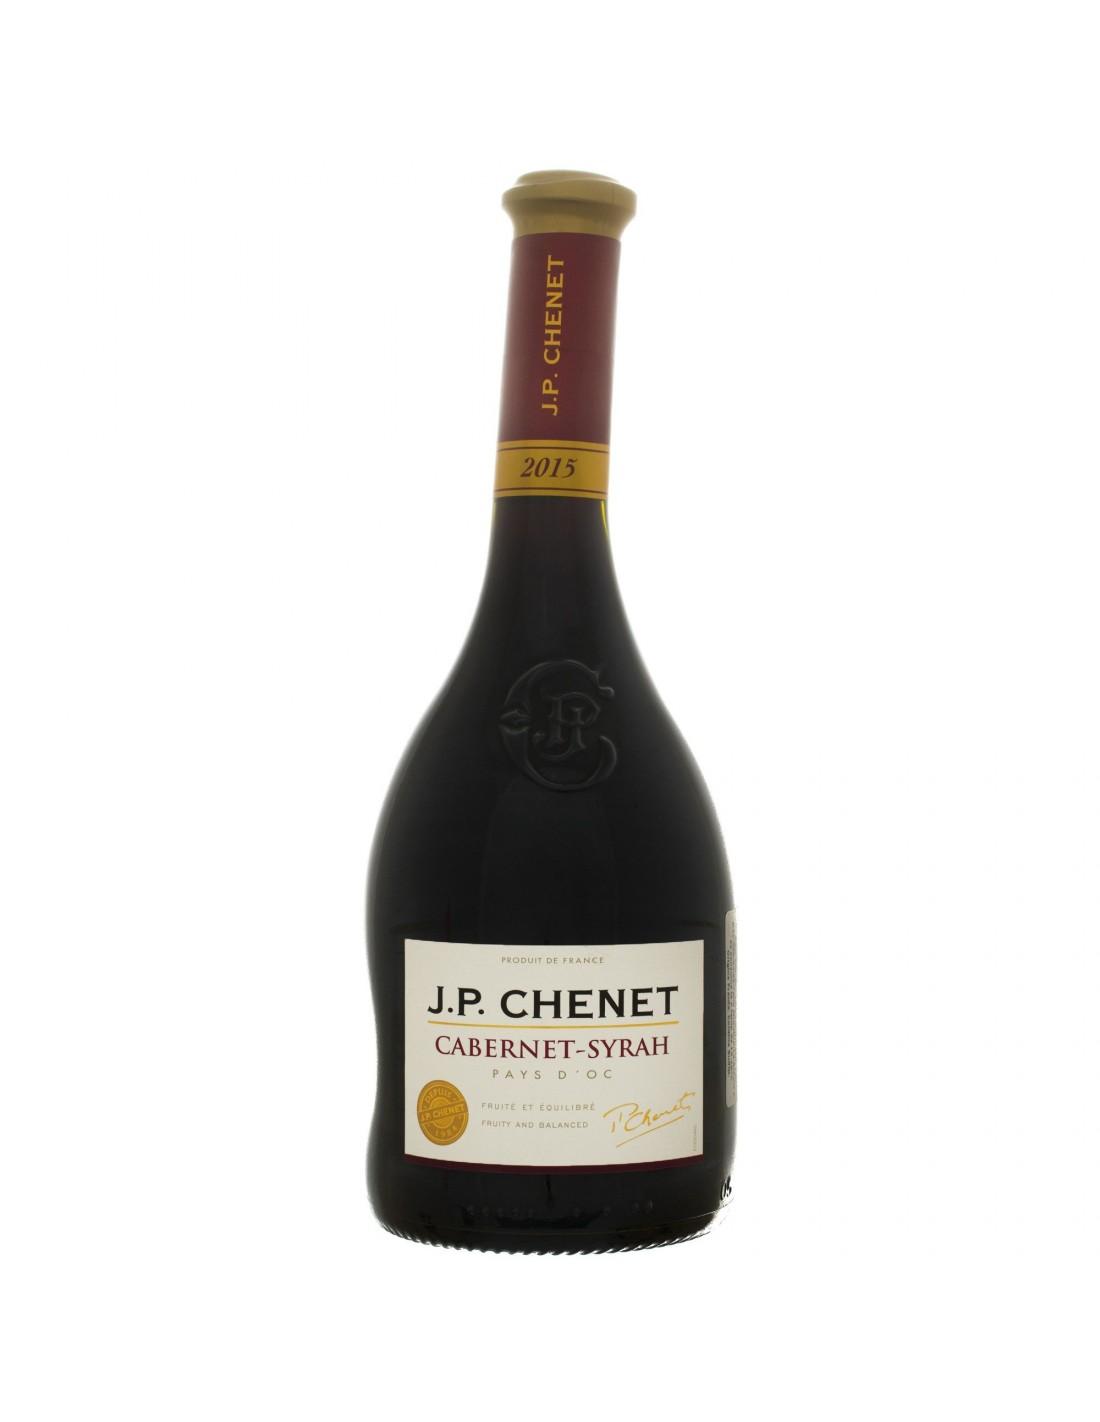 Vin rosu, Cabernet - Syrah, JP Chenet Pays d'Oc, 0.75L, 12.5% alc., Franta